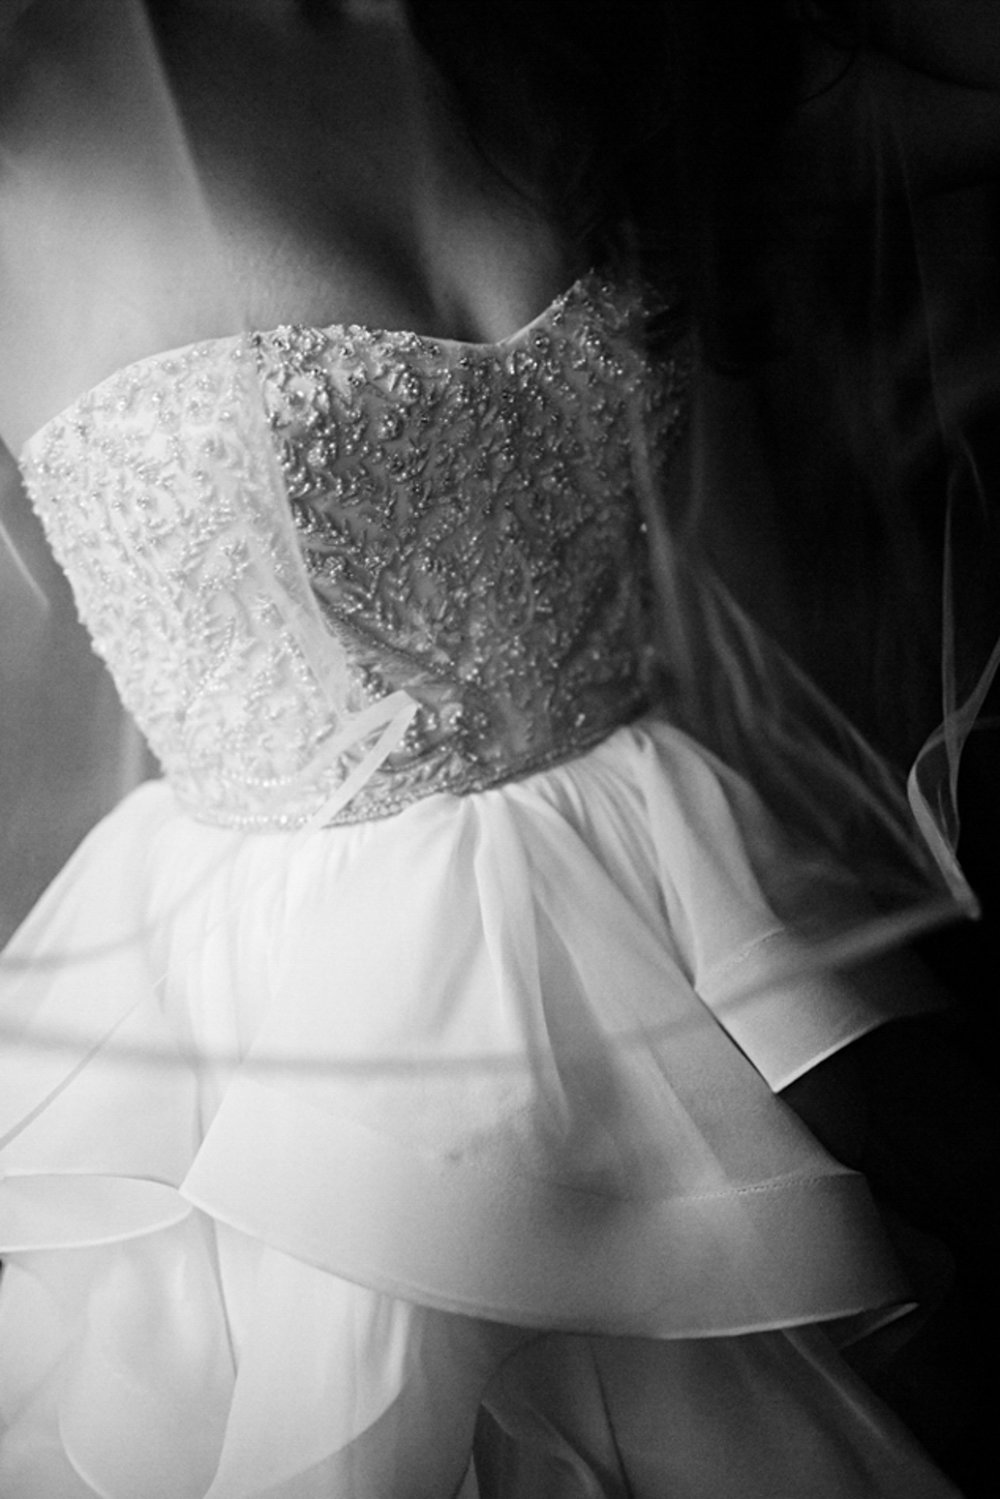 Gramercy-Park-Hotel-Weddings-11 copy.JPG